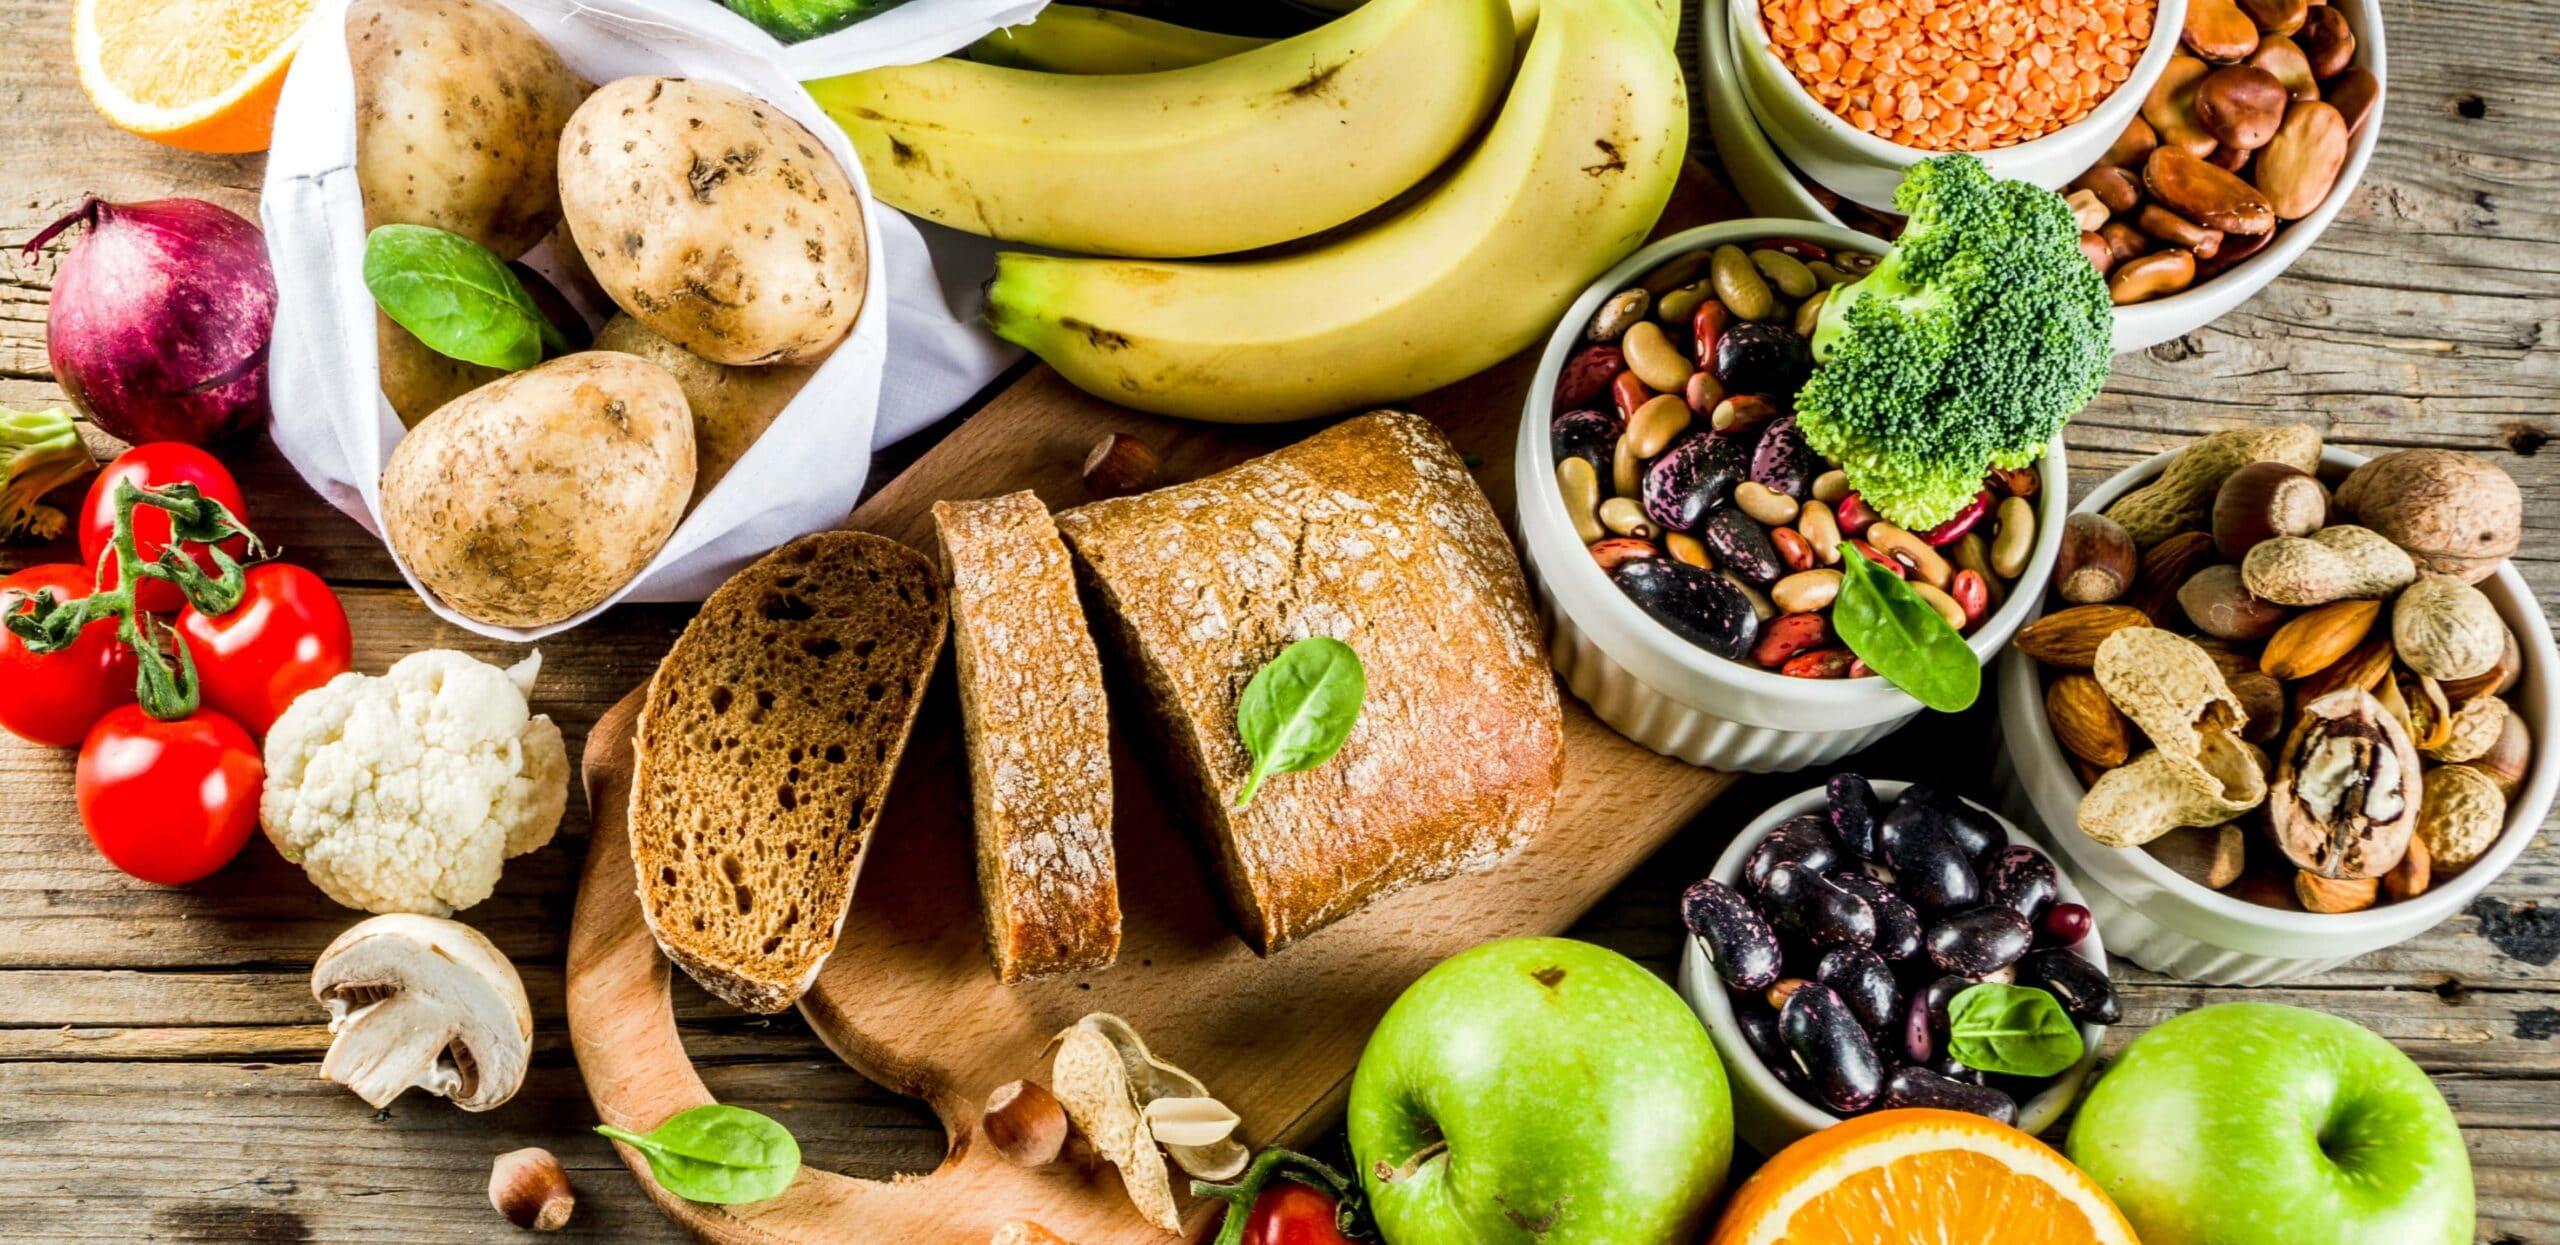 dieta dei carboidrati quali alimenti